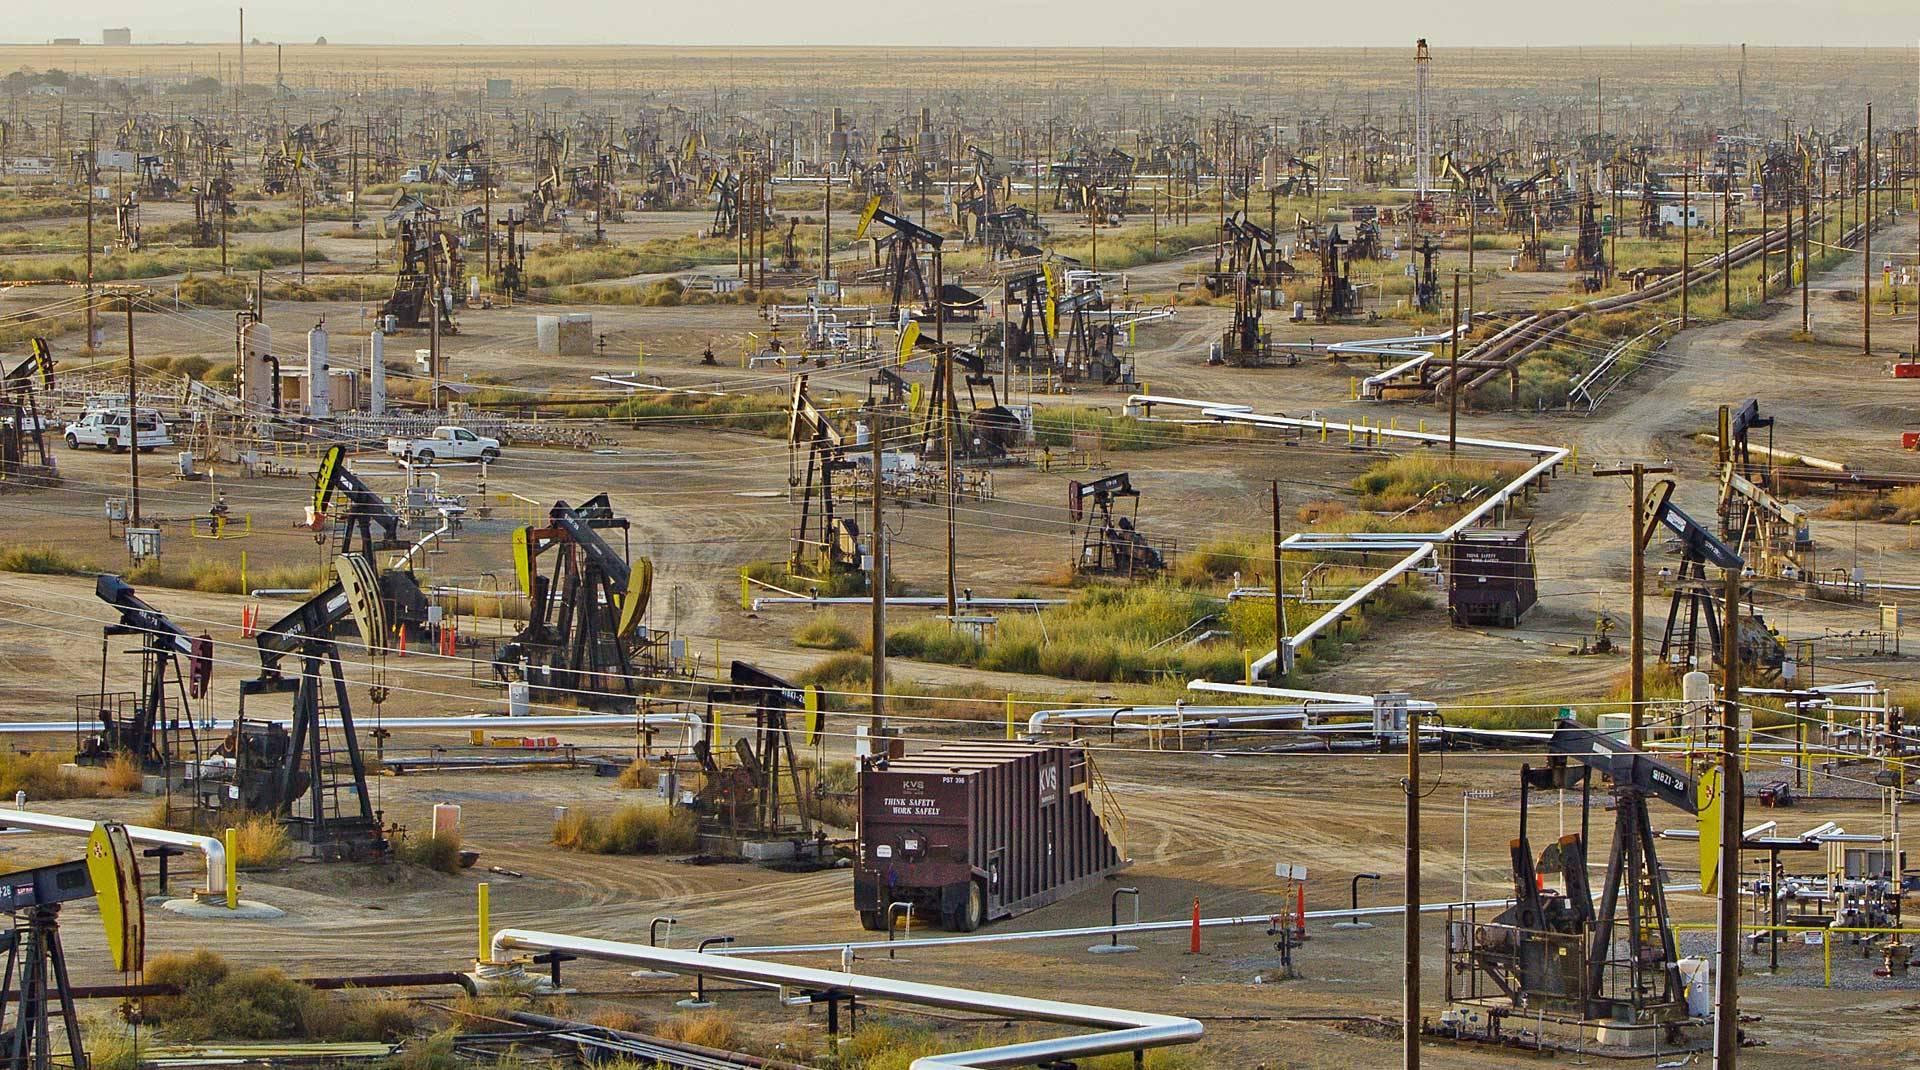 View of an oilfield.